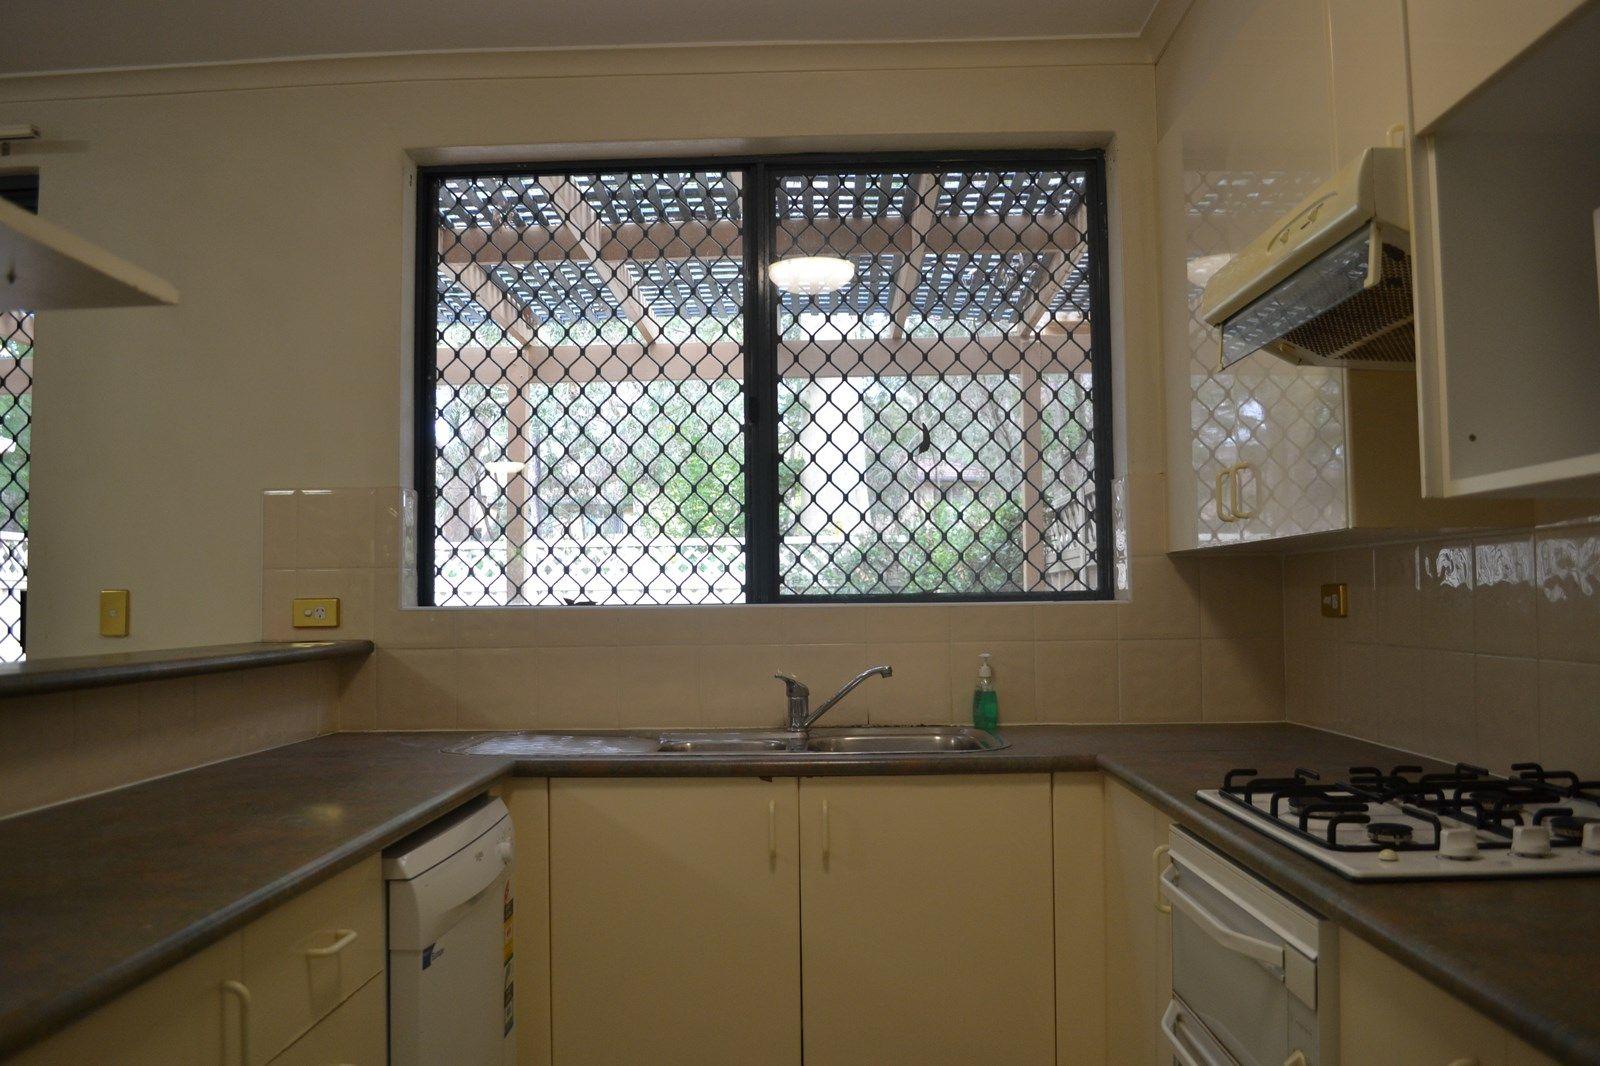 214/1-15 Fontenoy Road, Macquarie Park NSW 2113, Image 2